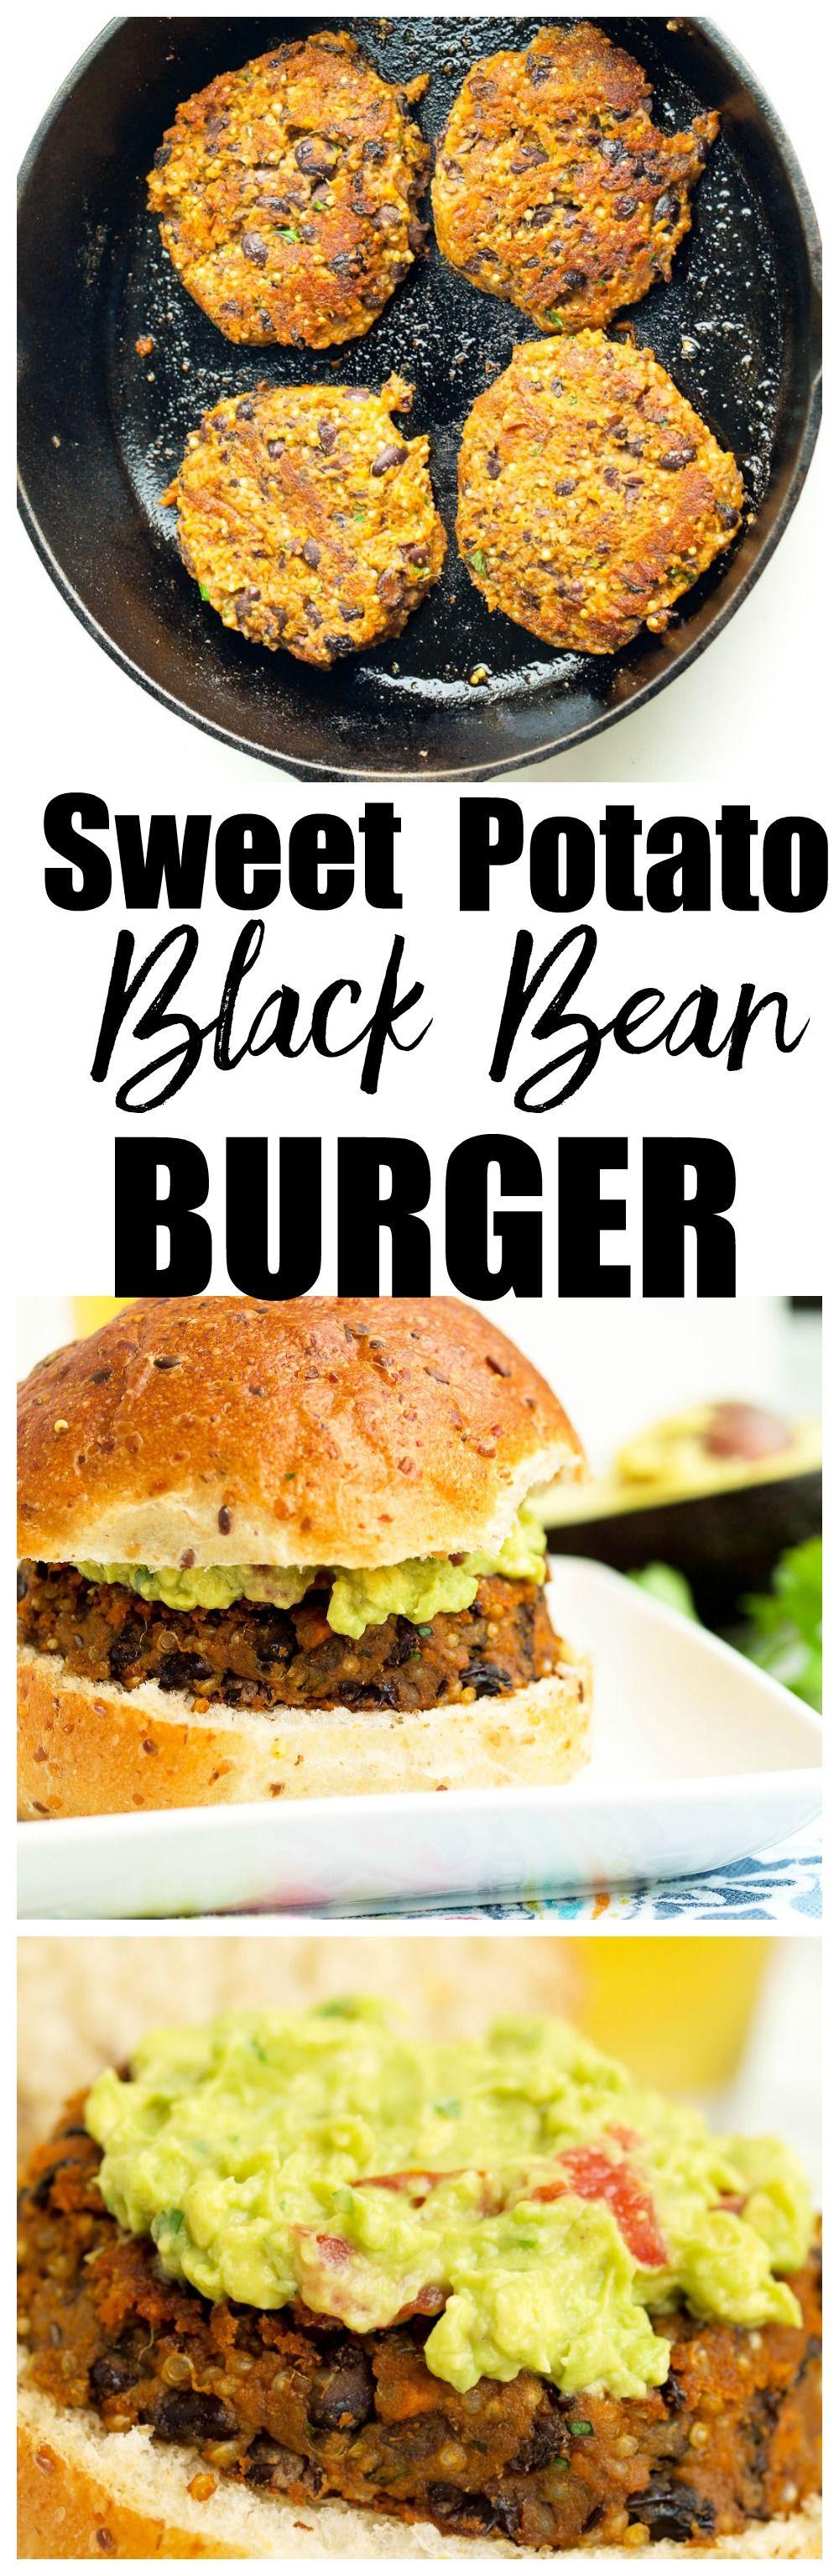 recipe: vegan gluten free black bean burgers [12]